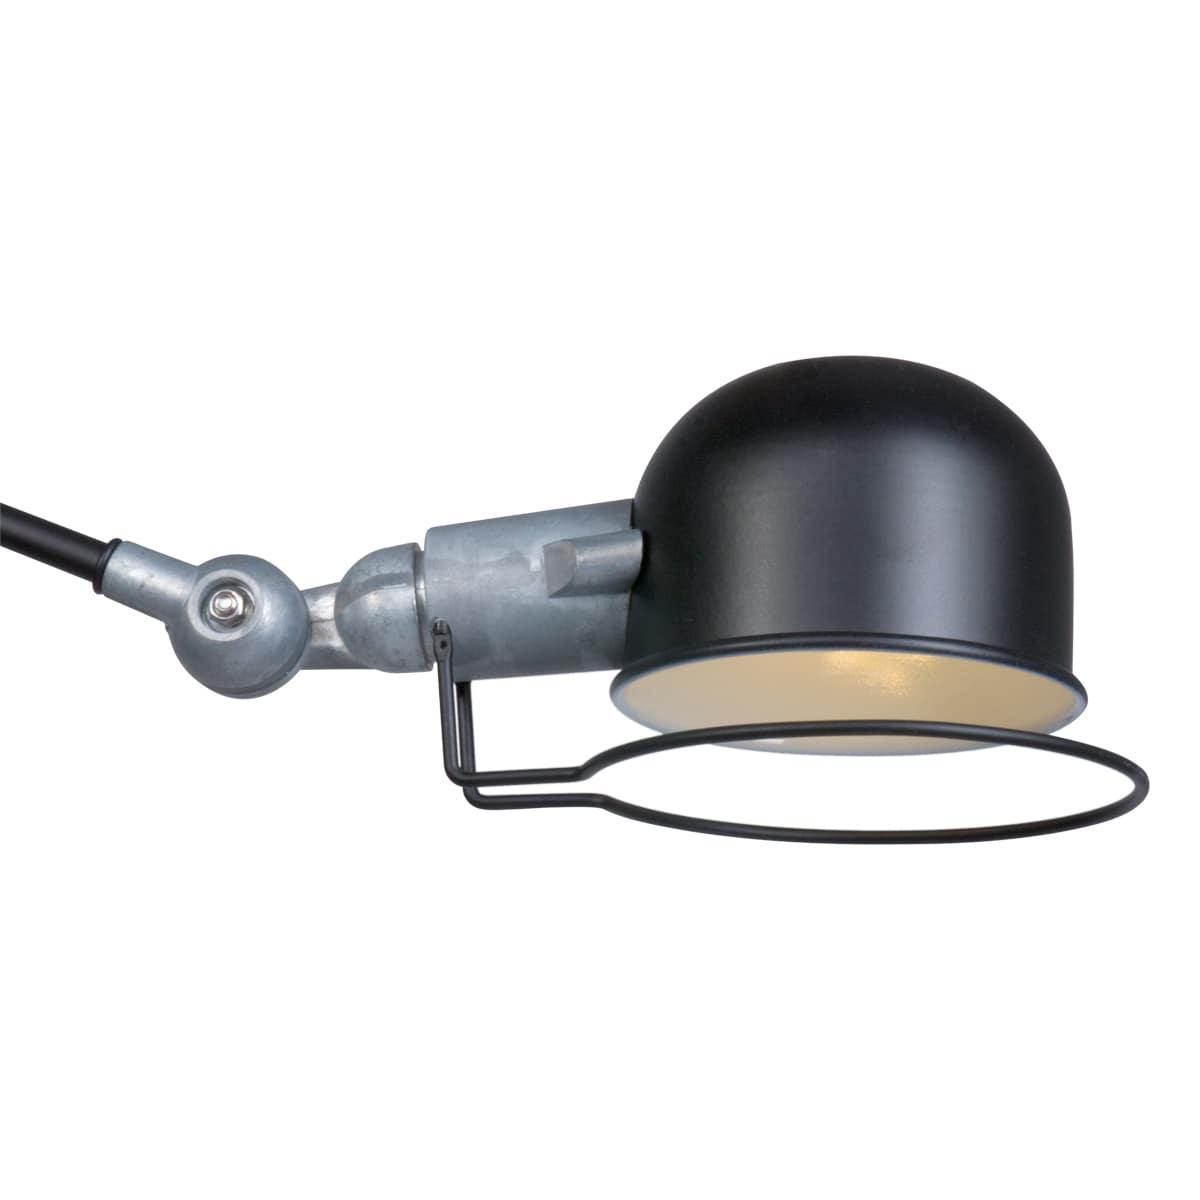 Wandlampe Leselampe Fabrik Design schwarz